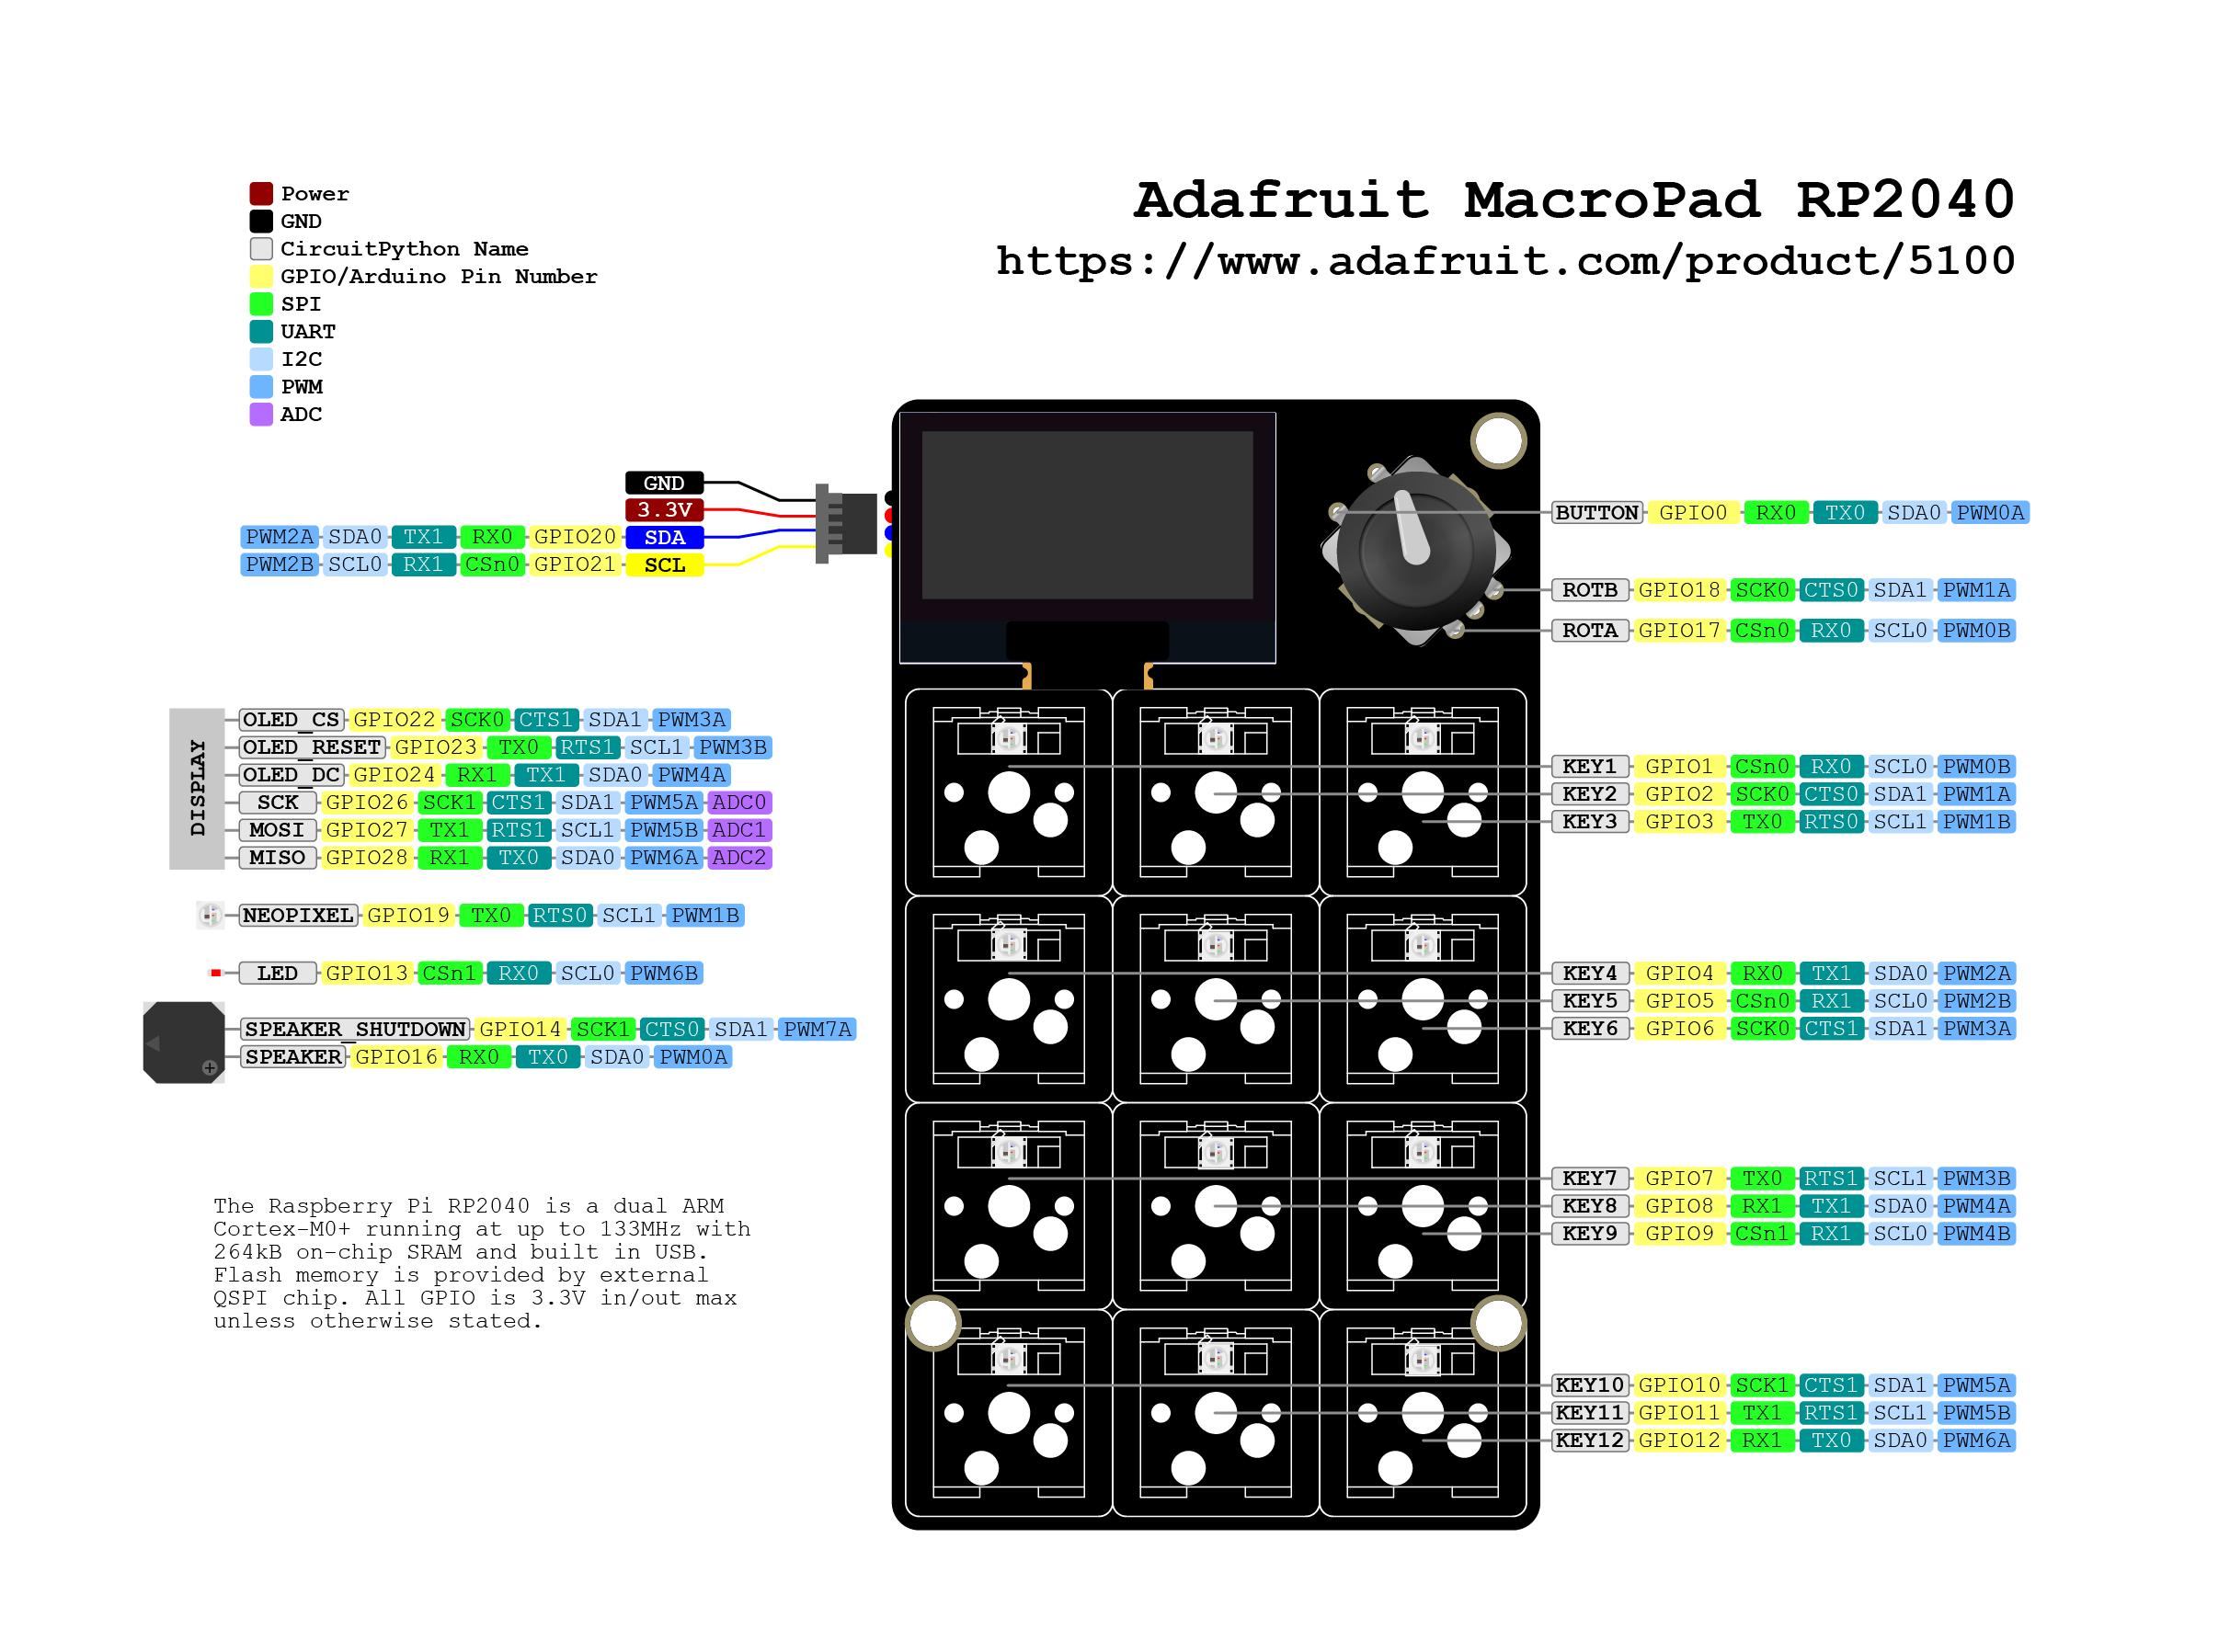 adafruit_products_Adafruit_MacroPad_RP2040_Pinout.png